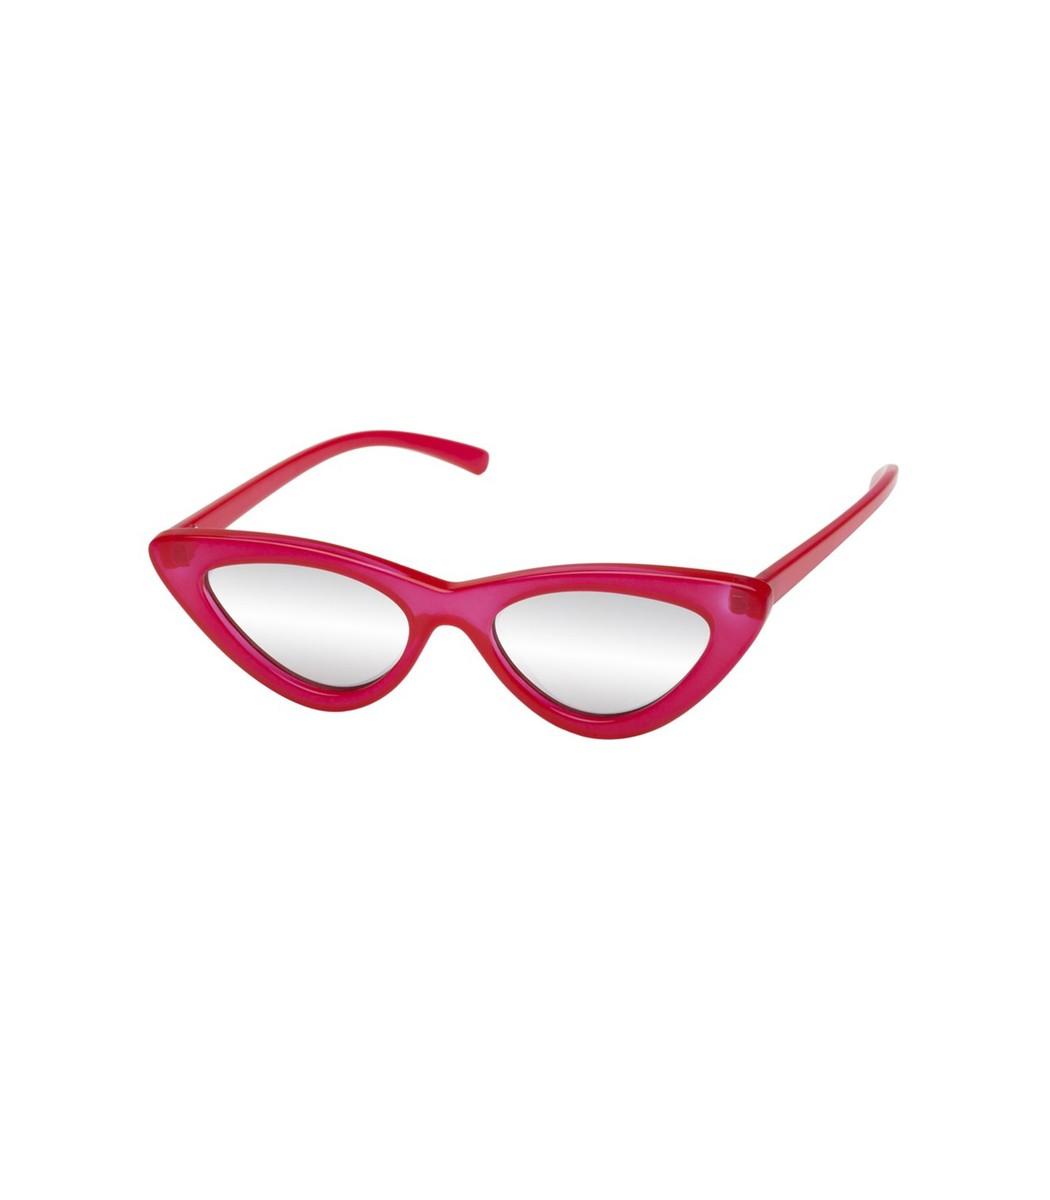 dad4ad87405 Le Specs + Adam Selman The Last Lolita Cat-Eye Acetate Mirrored Sunglasses  In Red